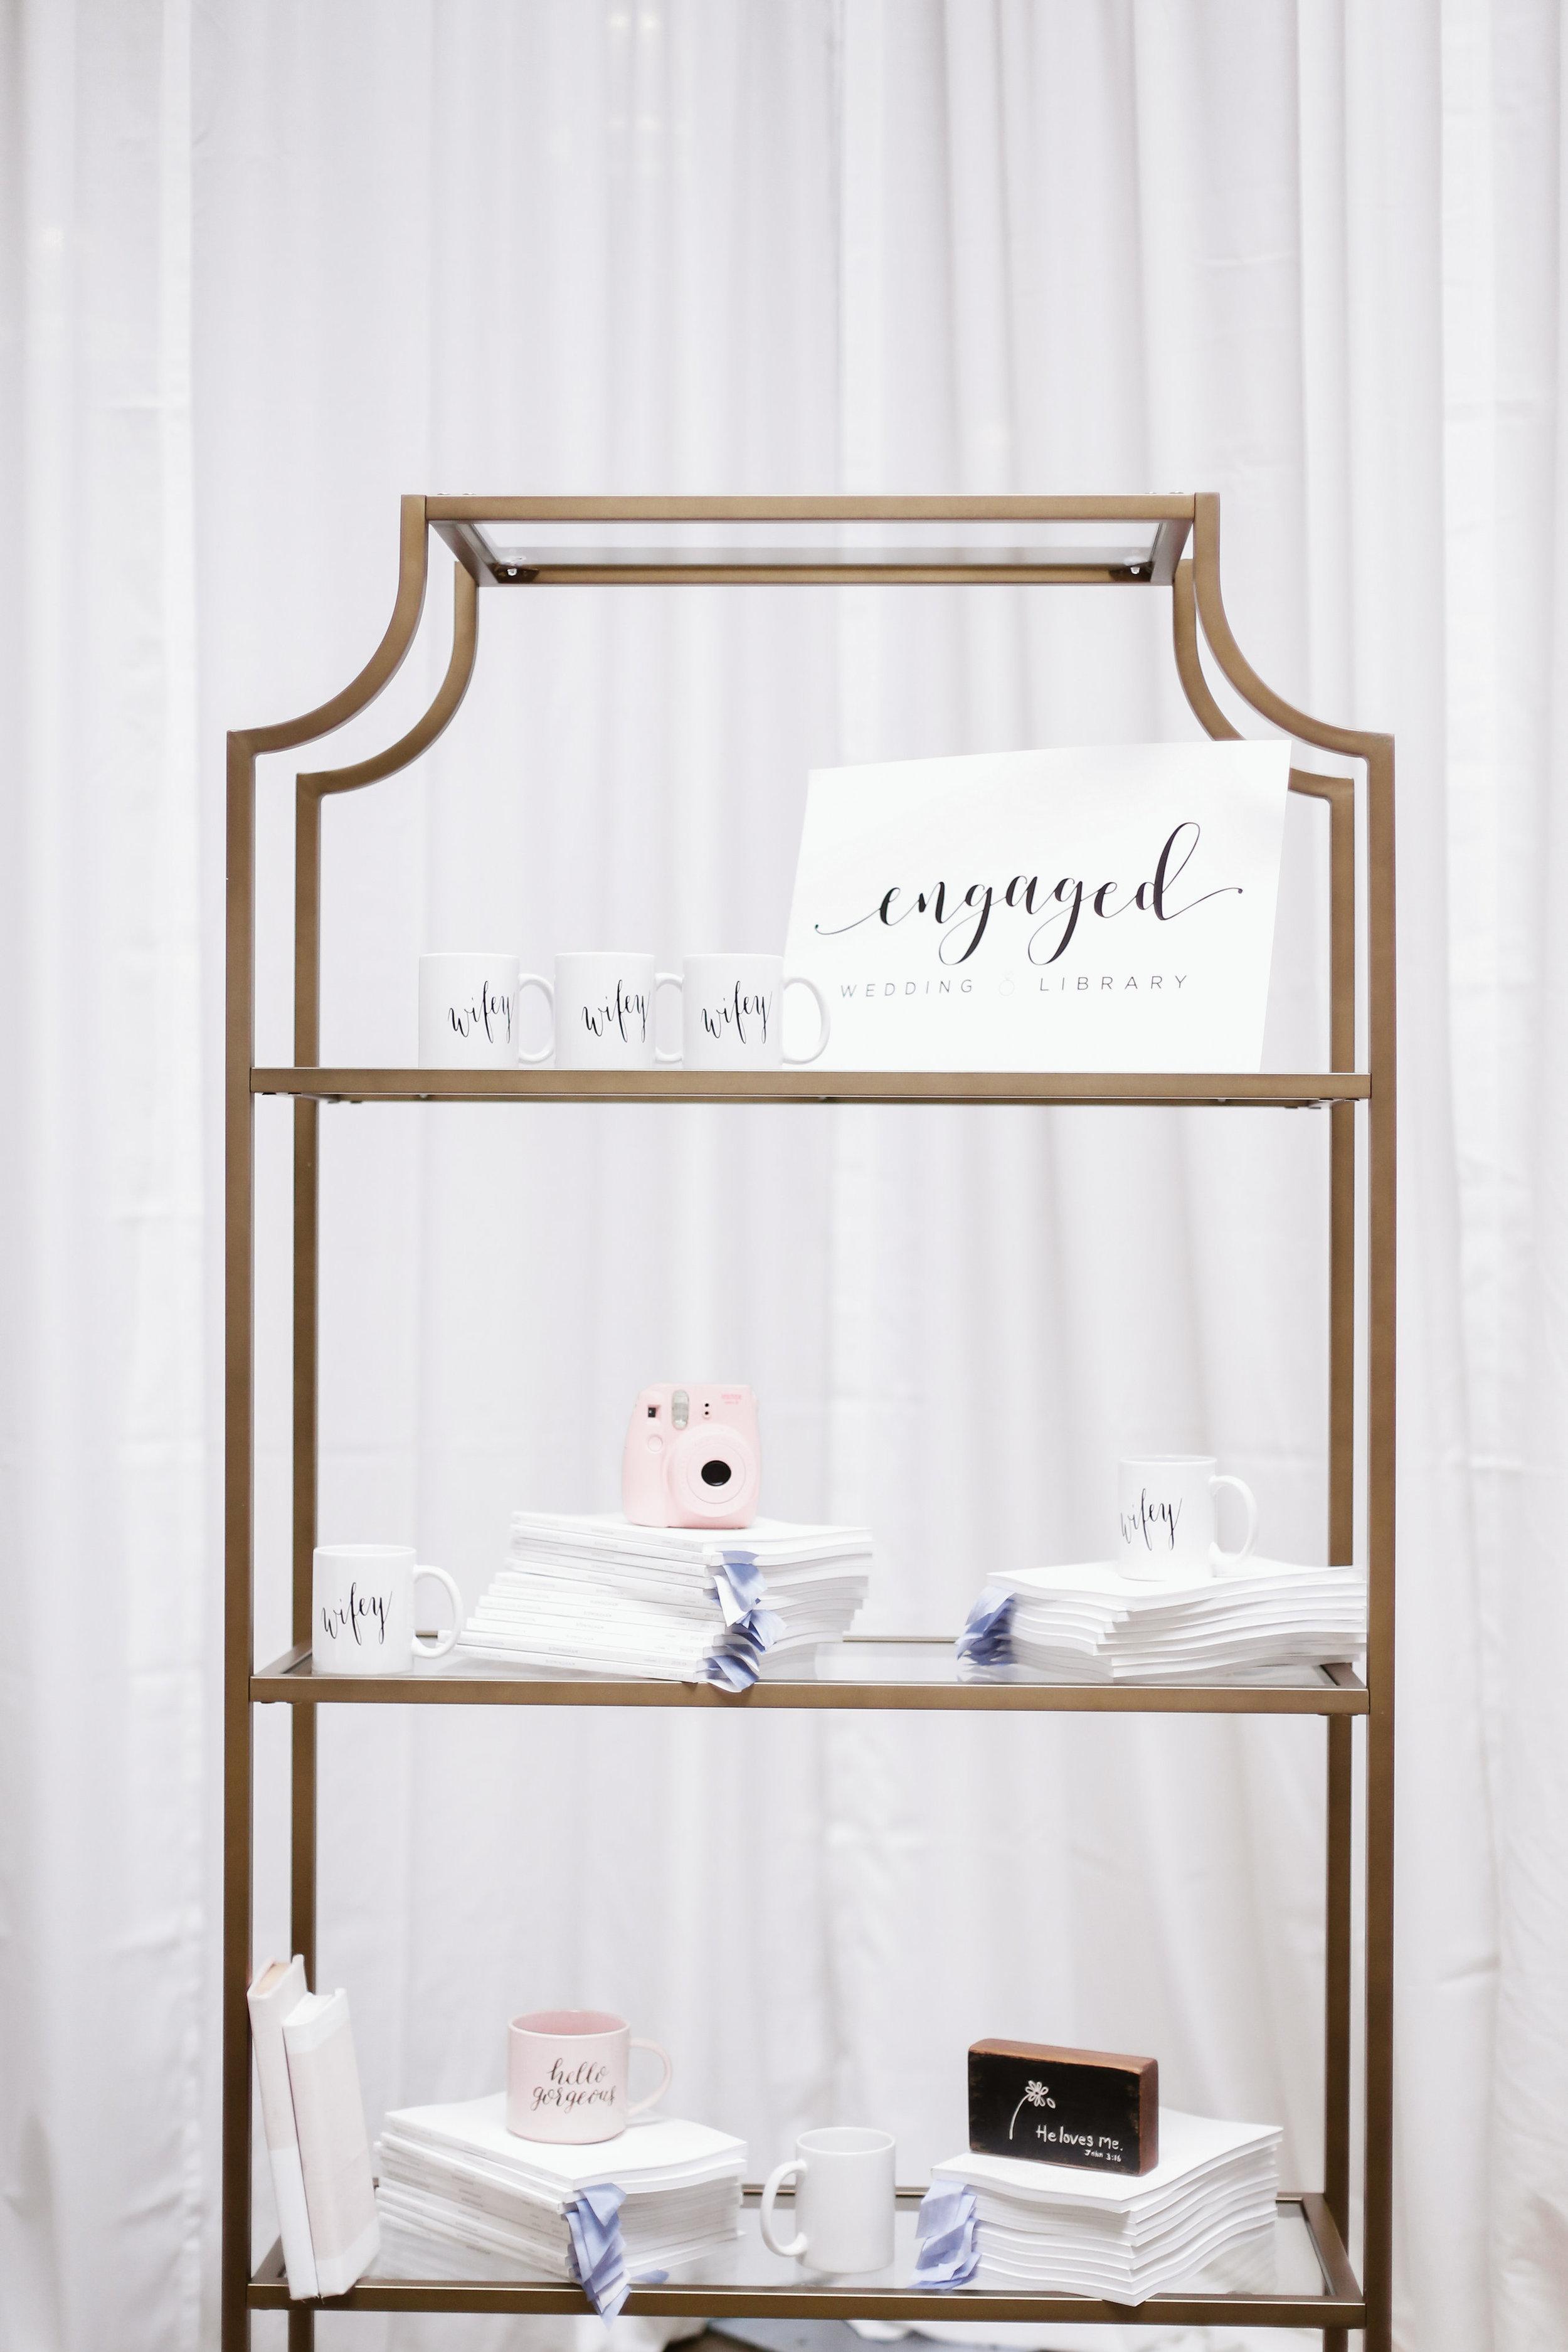 Engaged Event-Engaged Event-0061.jpg